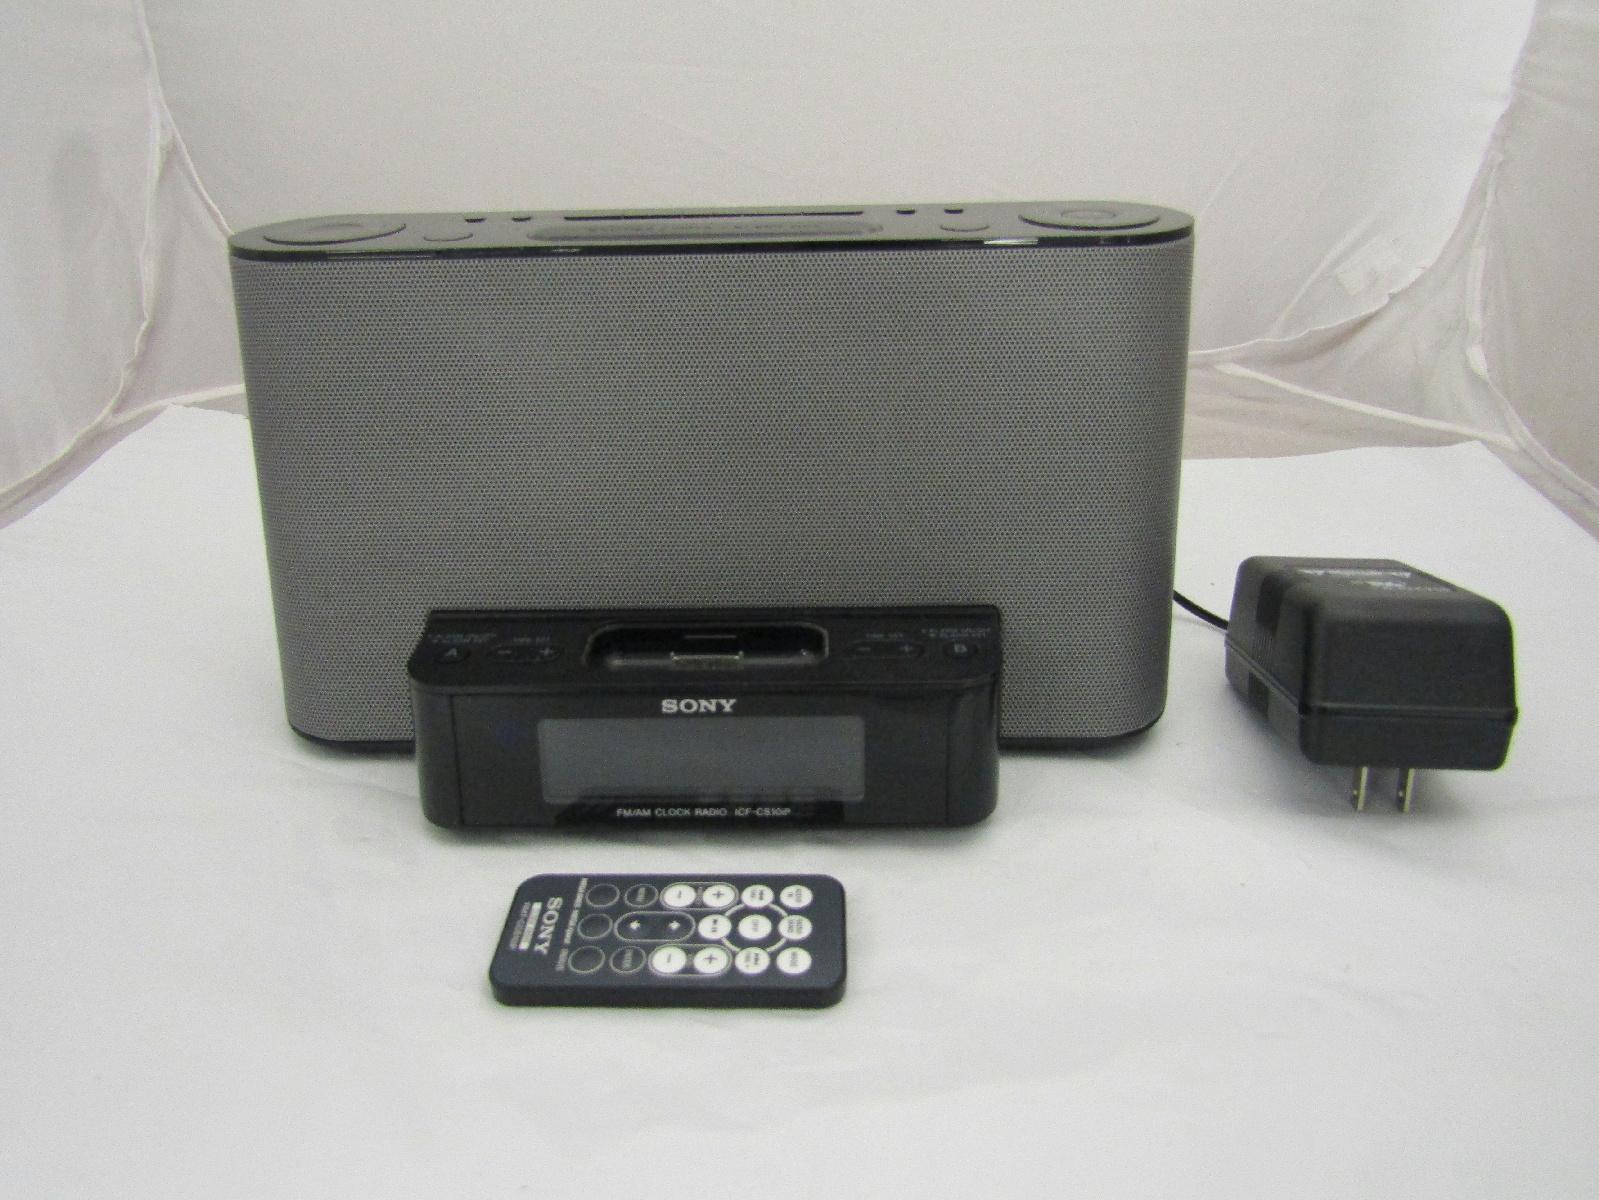 sony icf cs10ip ipod iphone speaker dock fm am radio alarm clock w remote ebay. Black Bedroom Furniture Sets. Home Design Ideas